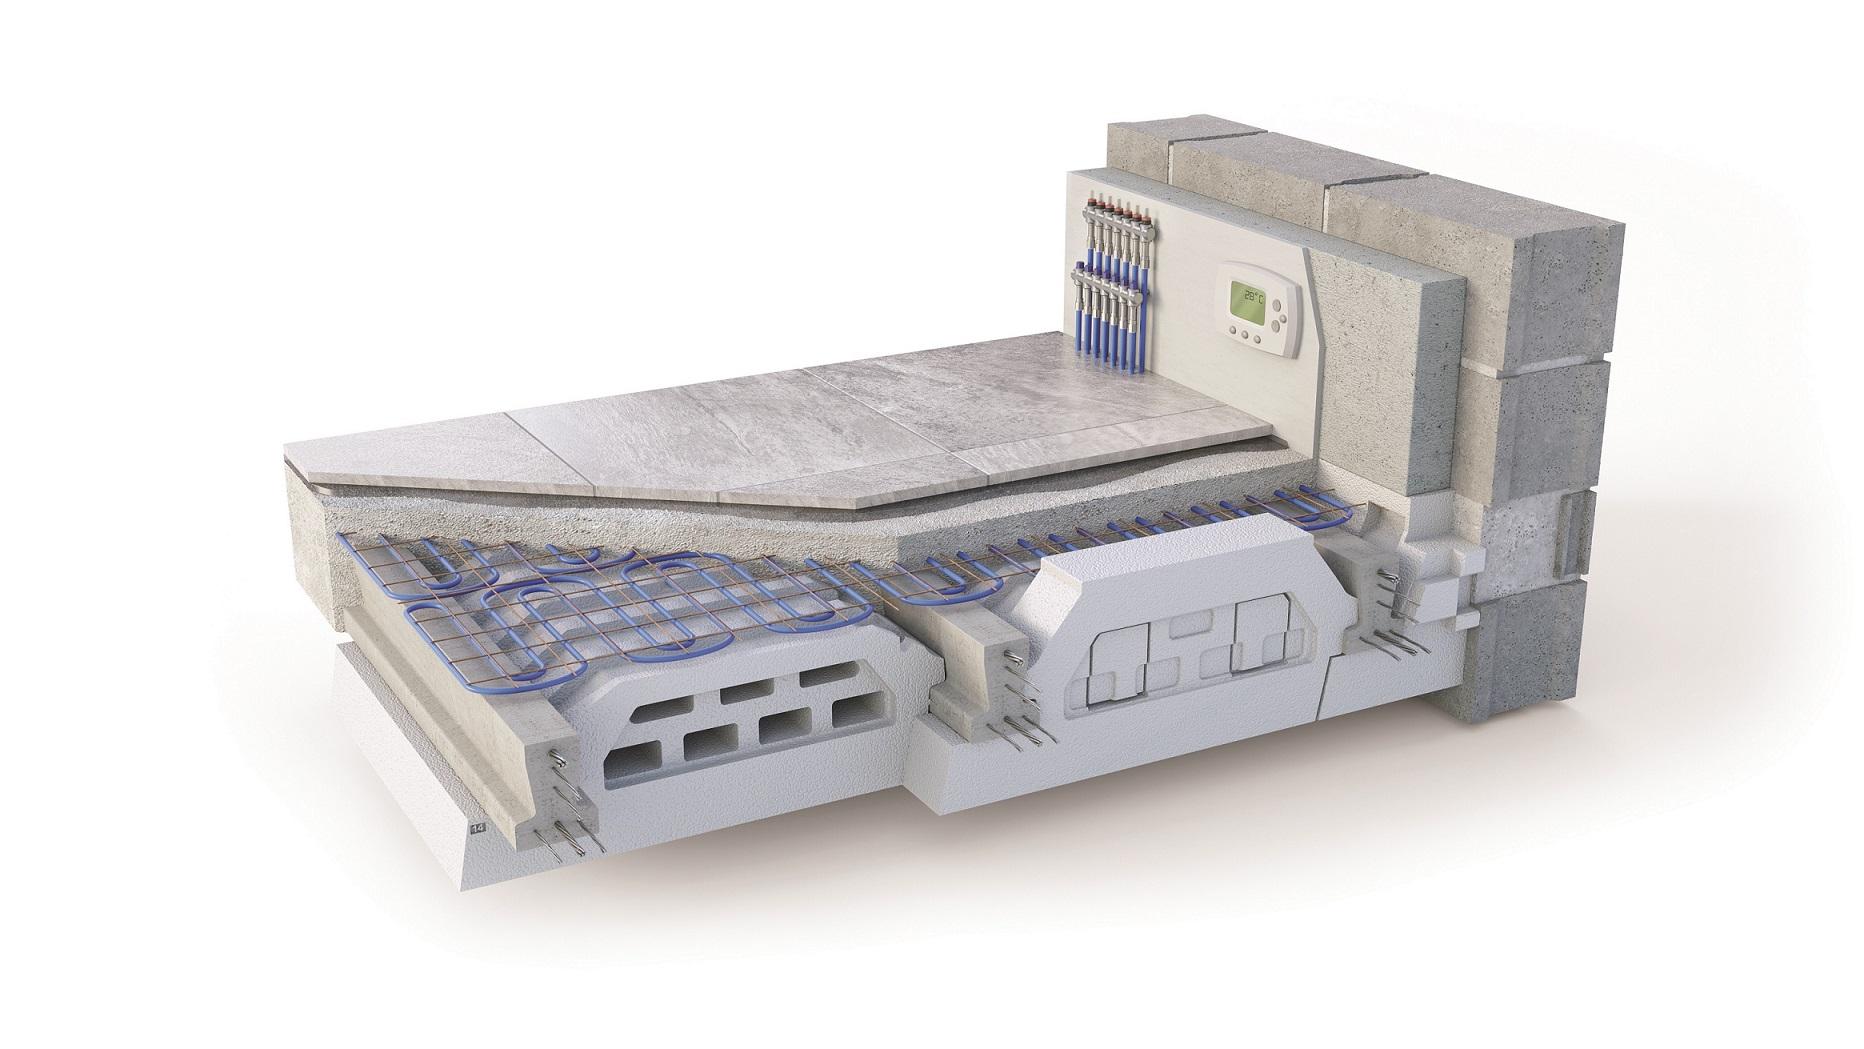 Visuel 3D Plancher Milliwatt Chauffant KP1